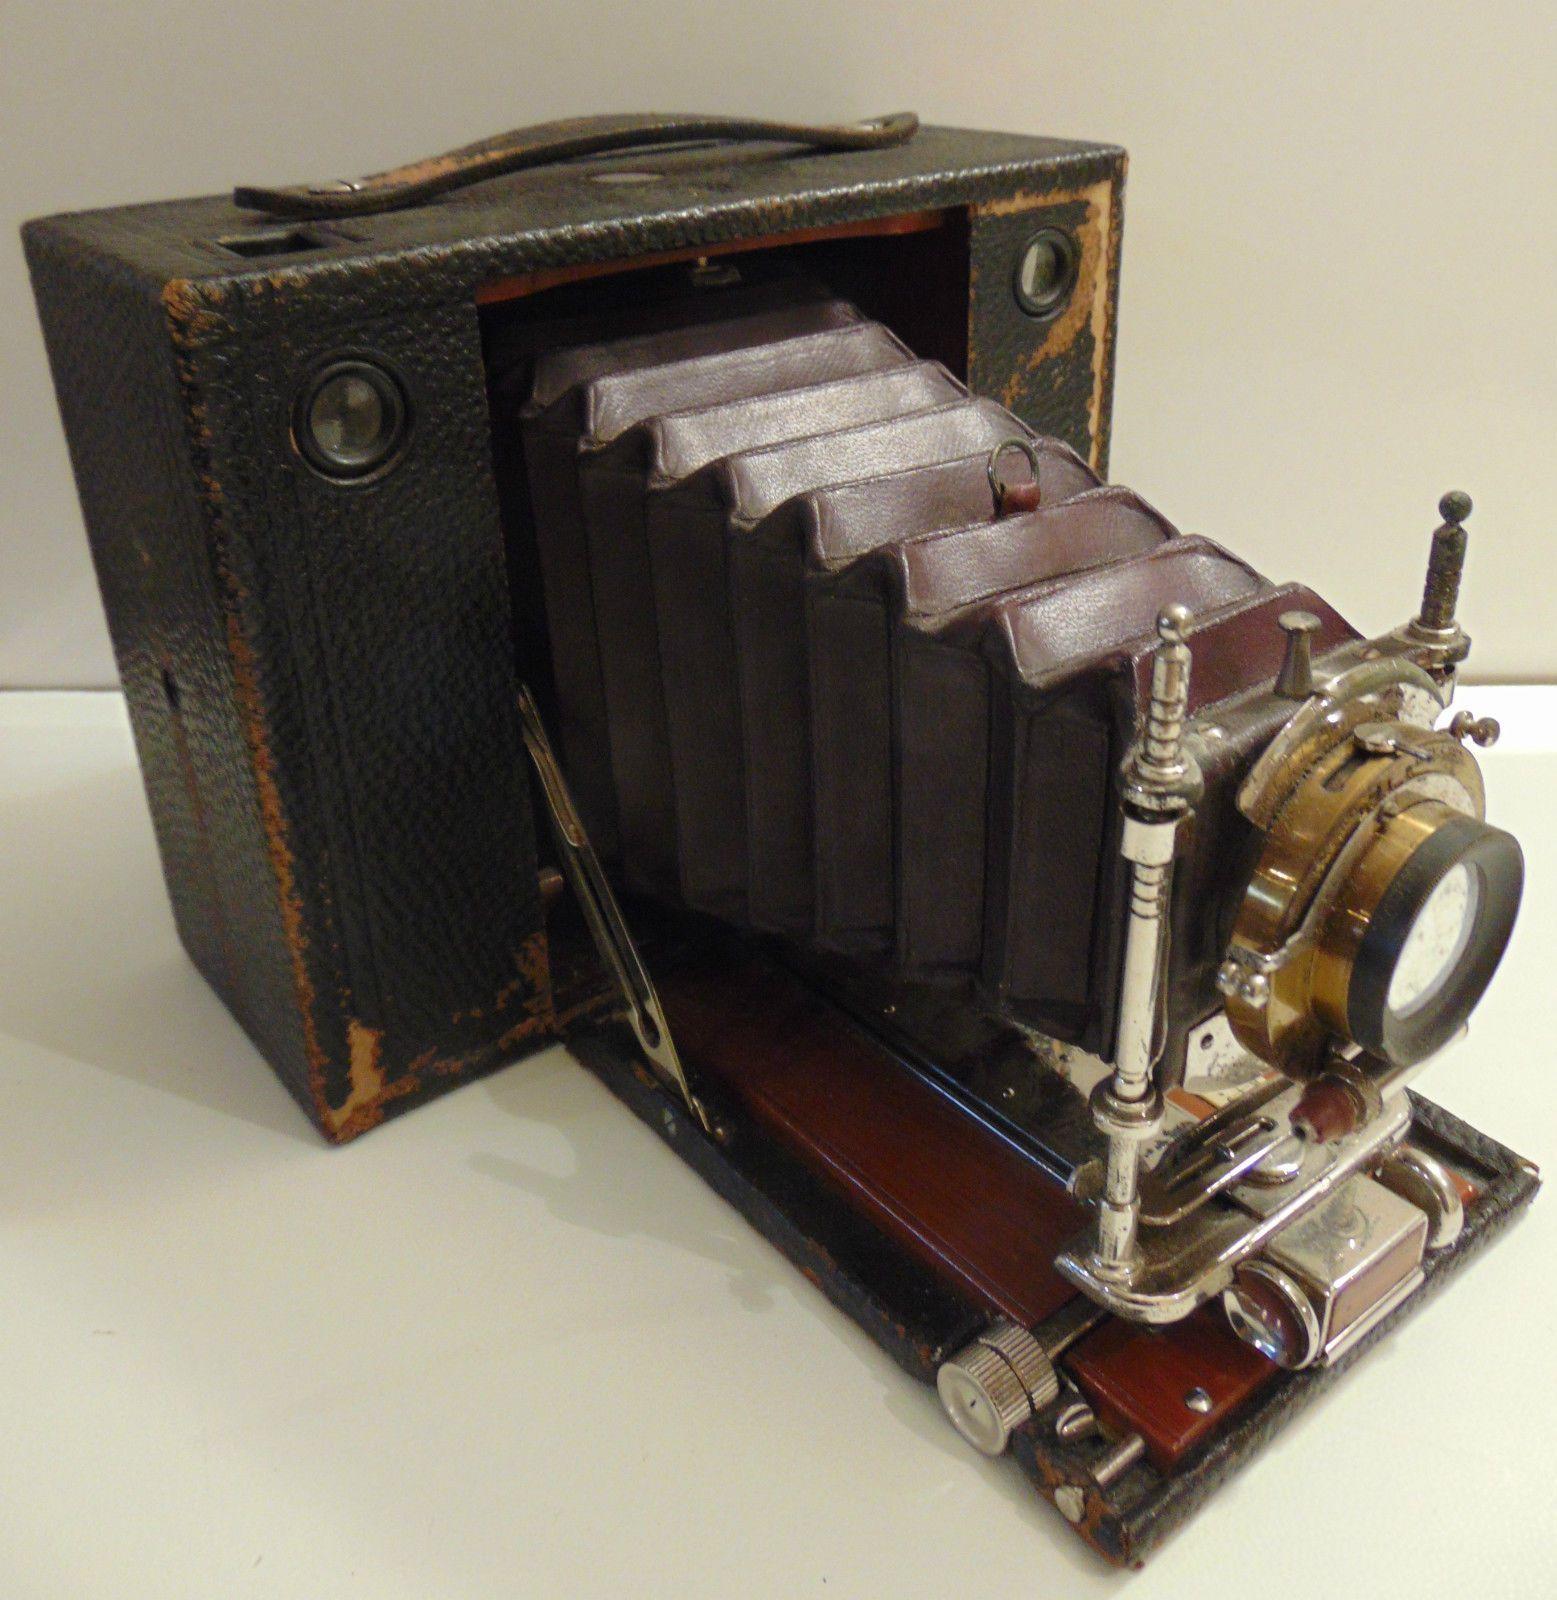 ancien appareil photo kodak n 4 cartridge soufflet rochester usa eastman kodak photographic. Black Bedroom Furniture Sets. Home Design Ideas